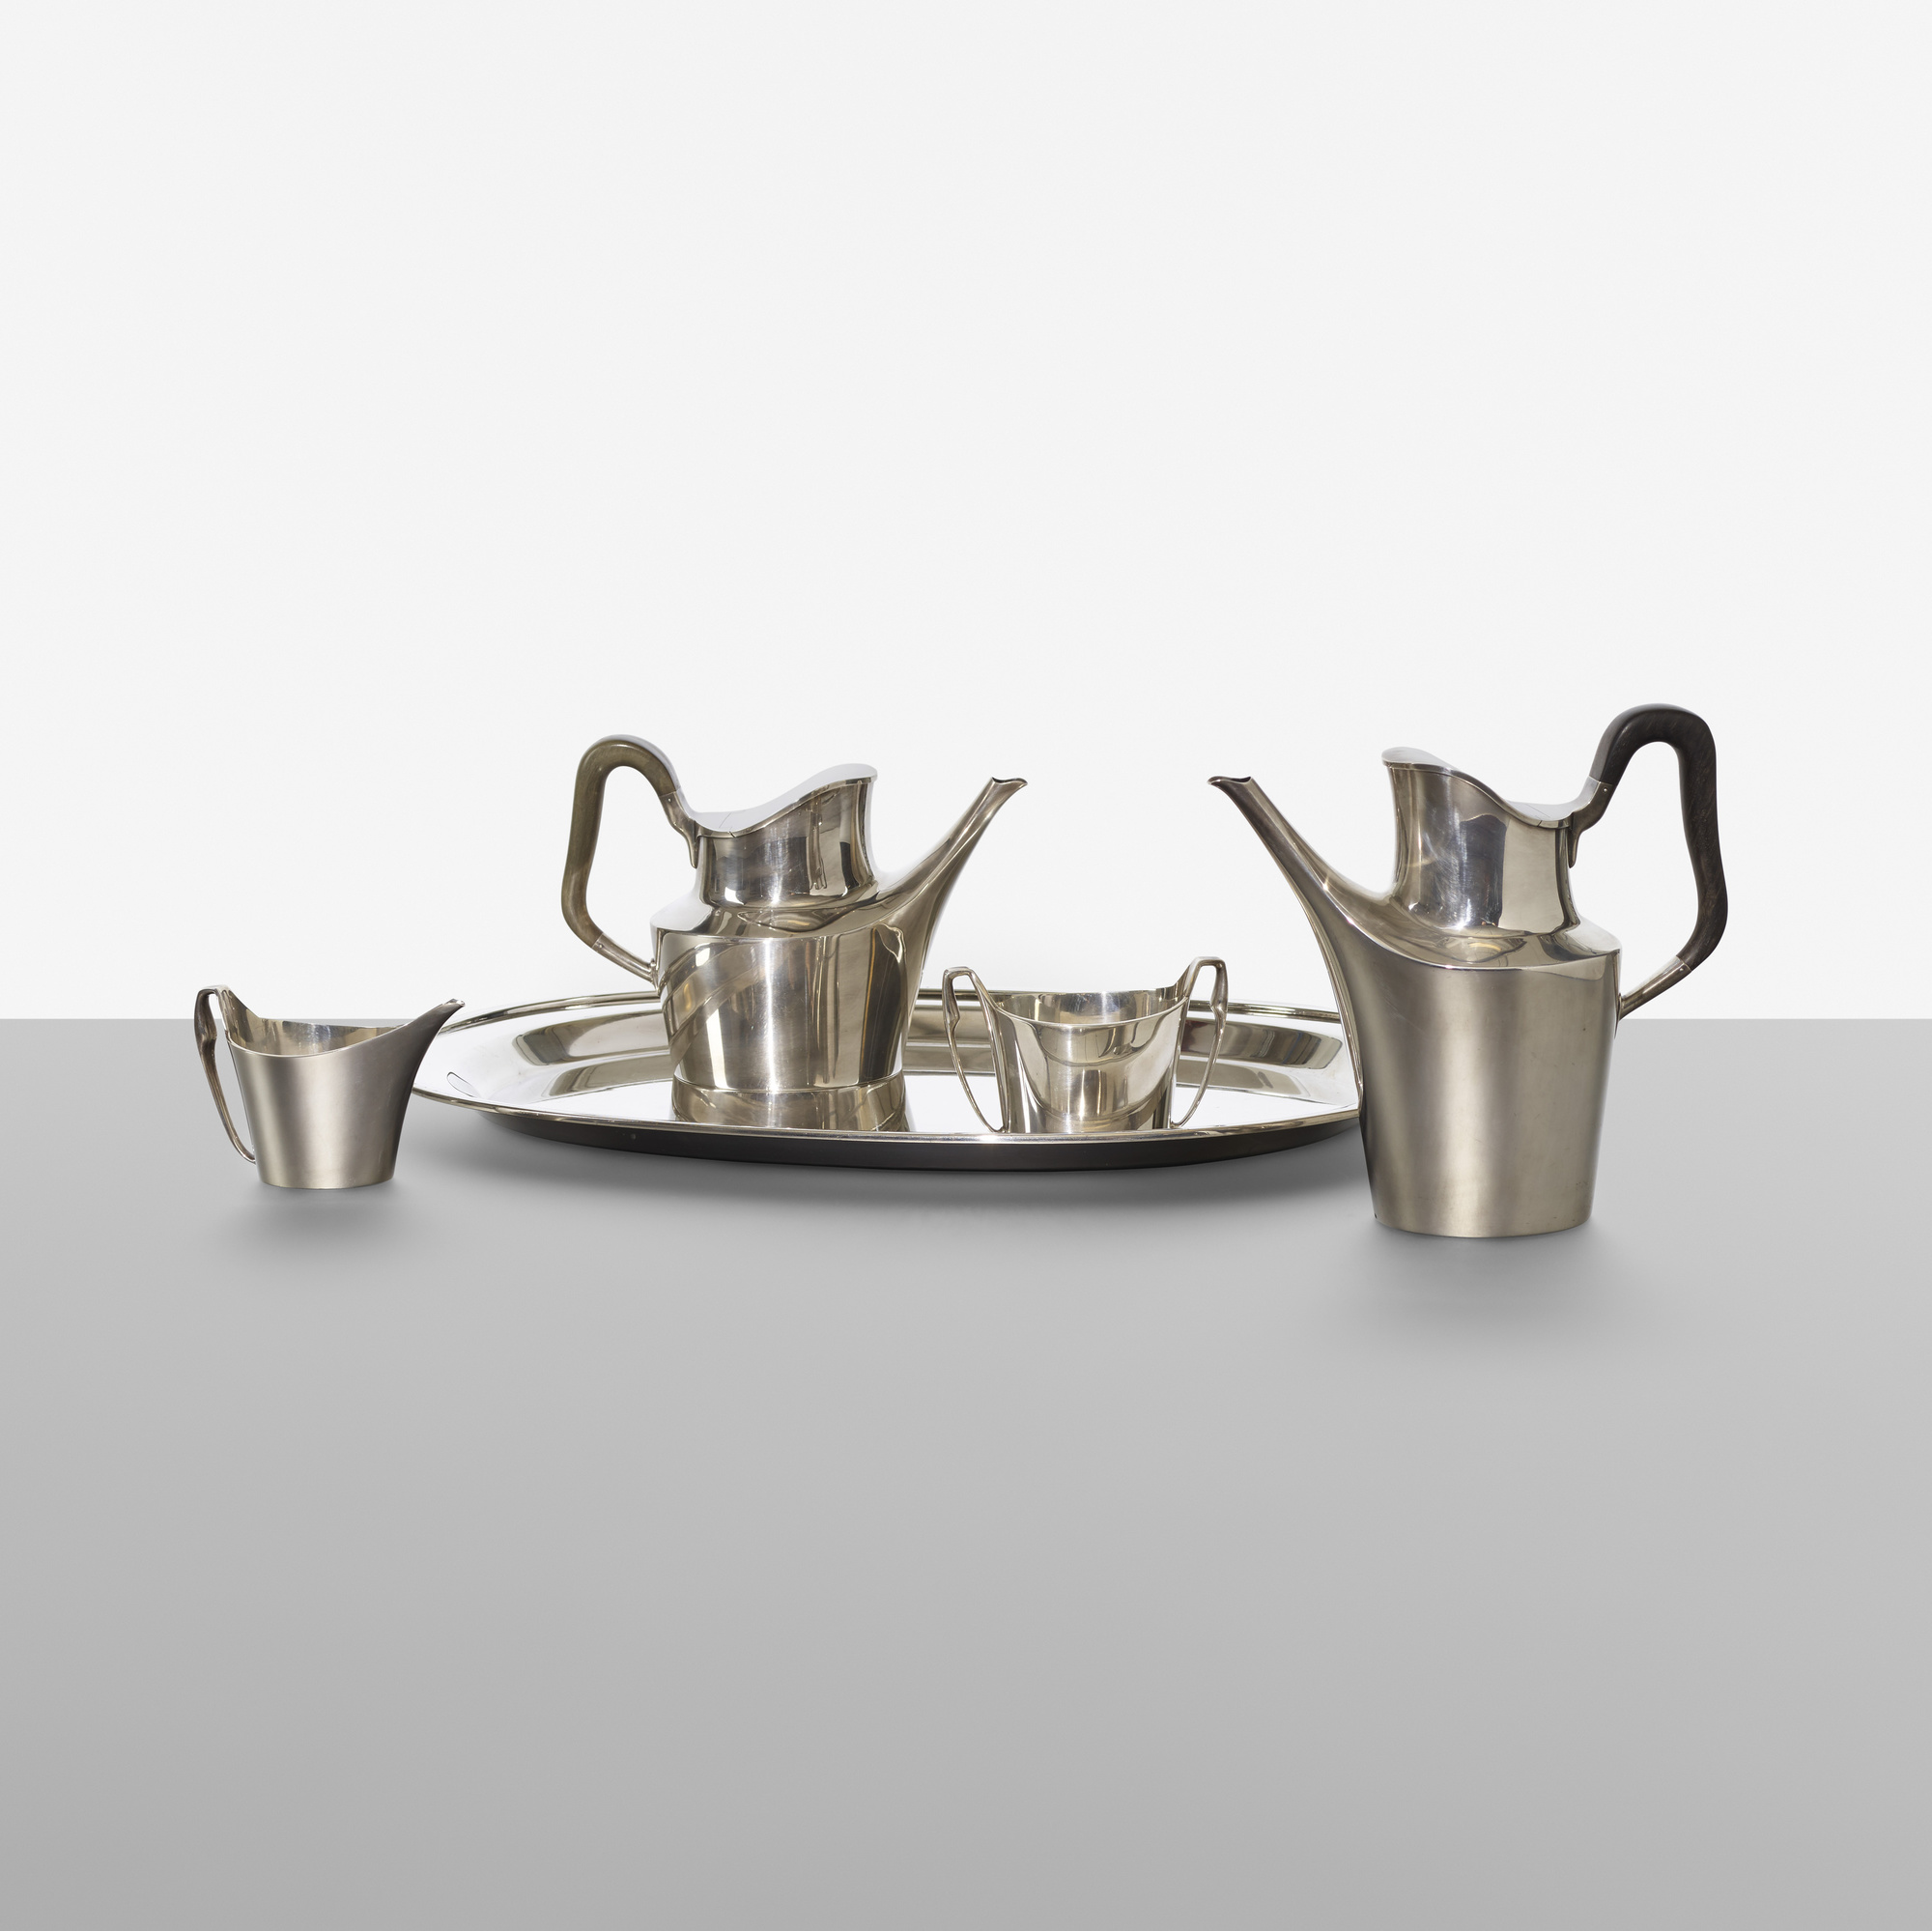 340: Hans Hansen / coffee and tea service (1 of 2)